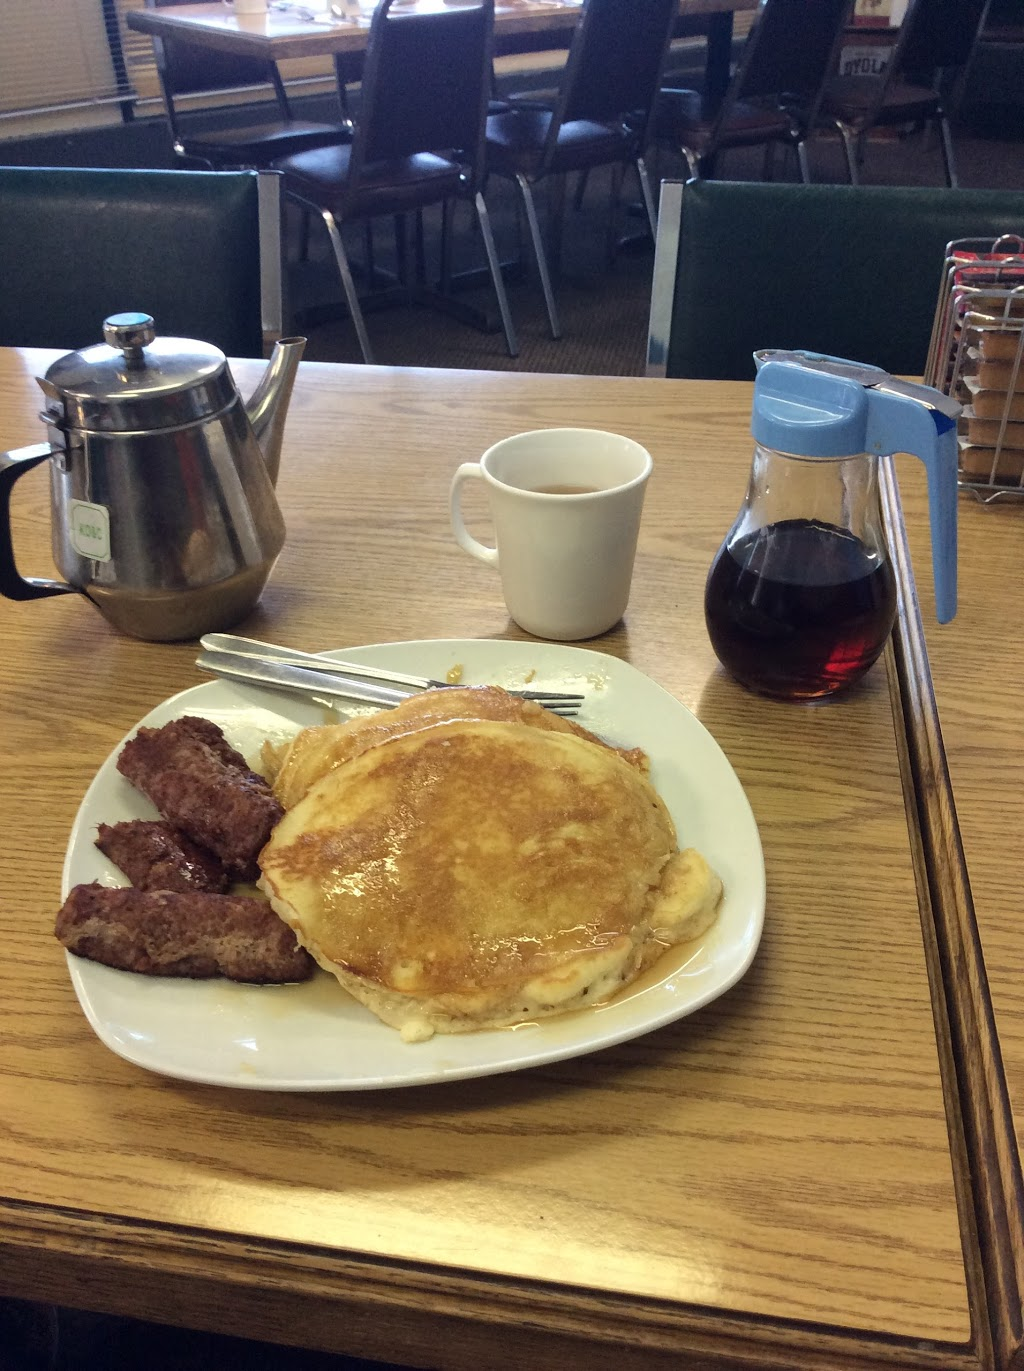 Taunte Marias Restaurant | restaurant | 1-2210, Millar Ave, Saskatoon, SK S7K 4L1, Canada | 3063843414 OR +1 306-384-3414